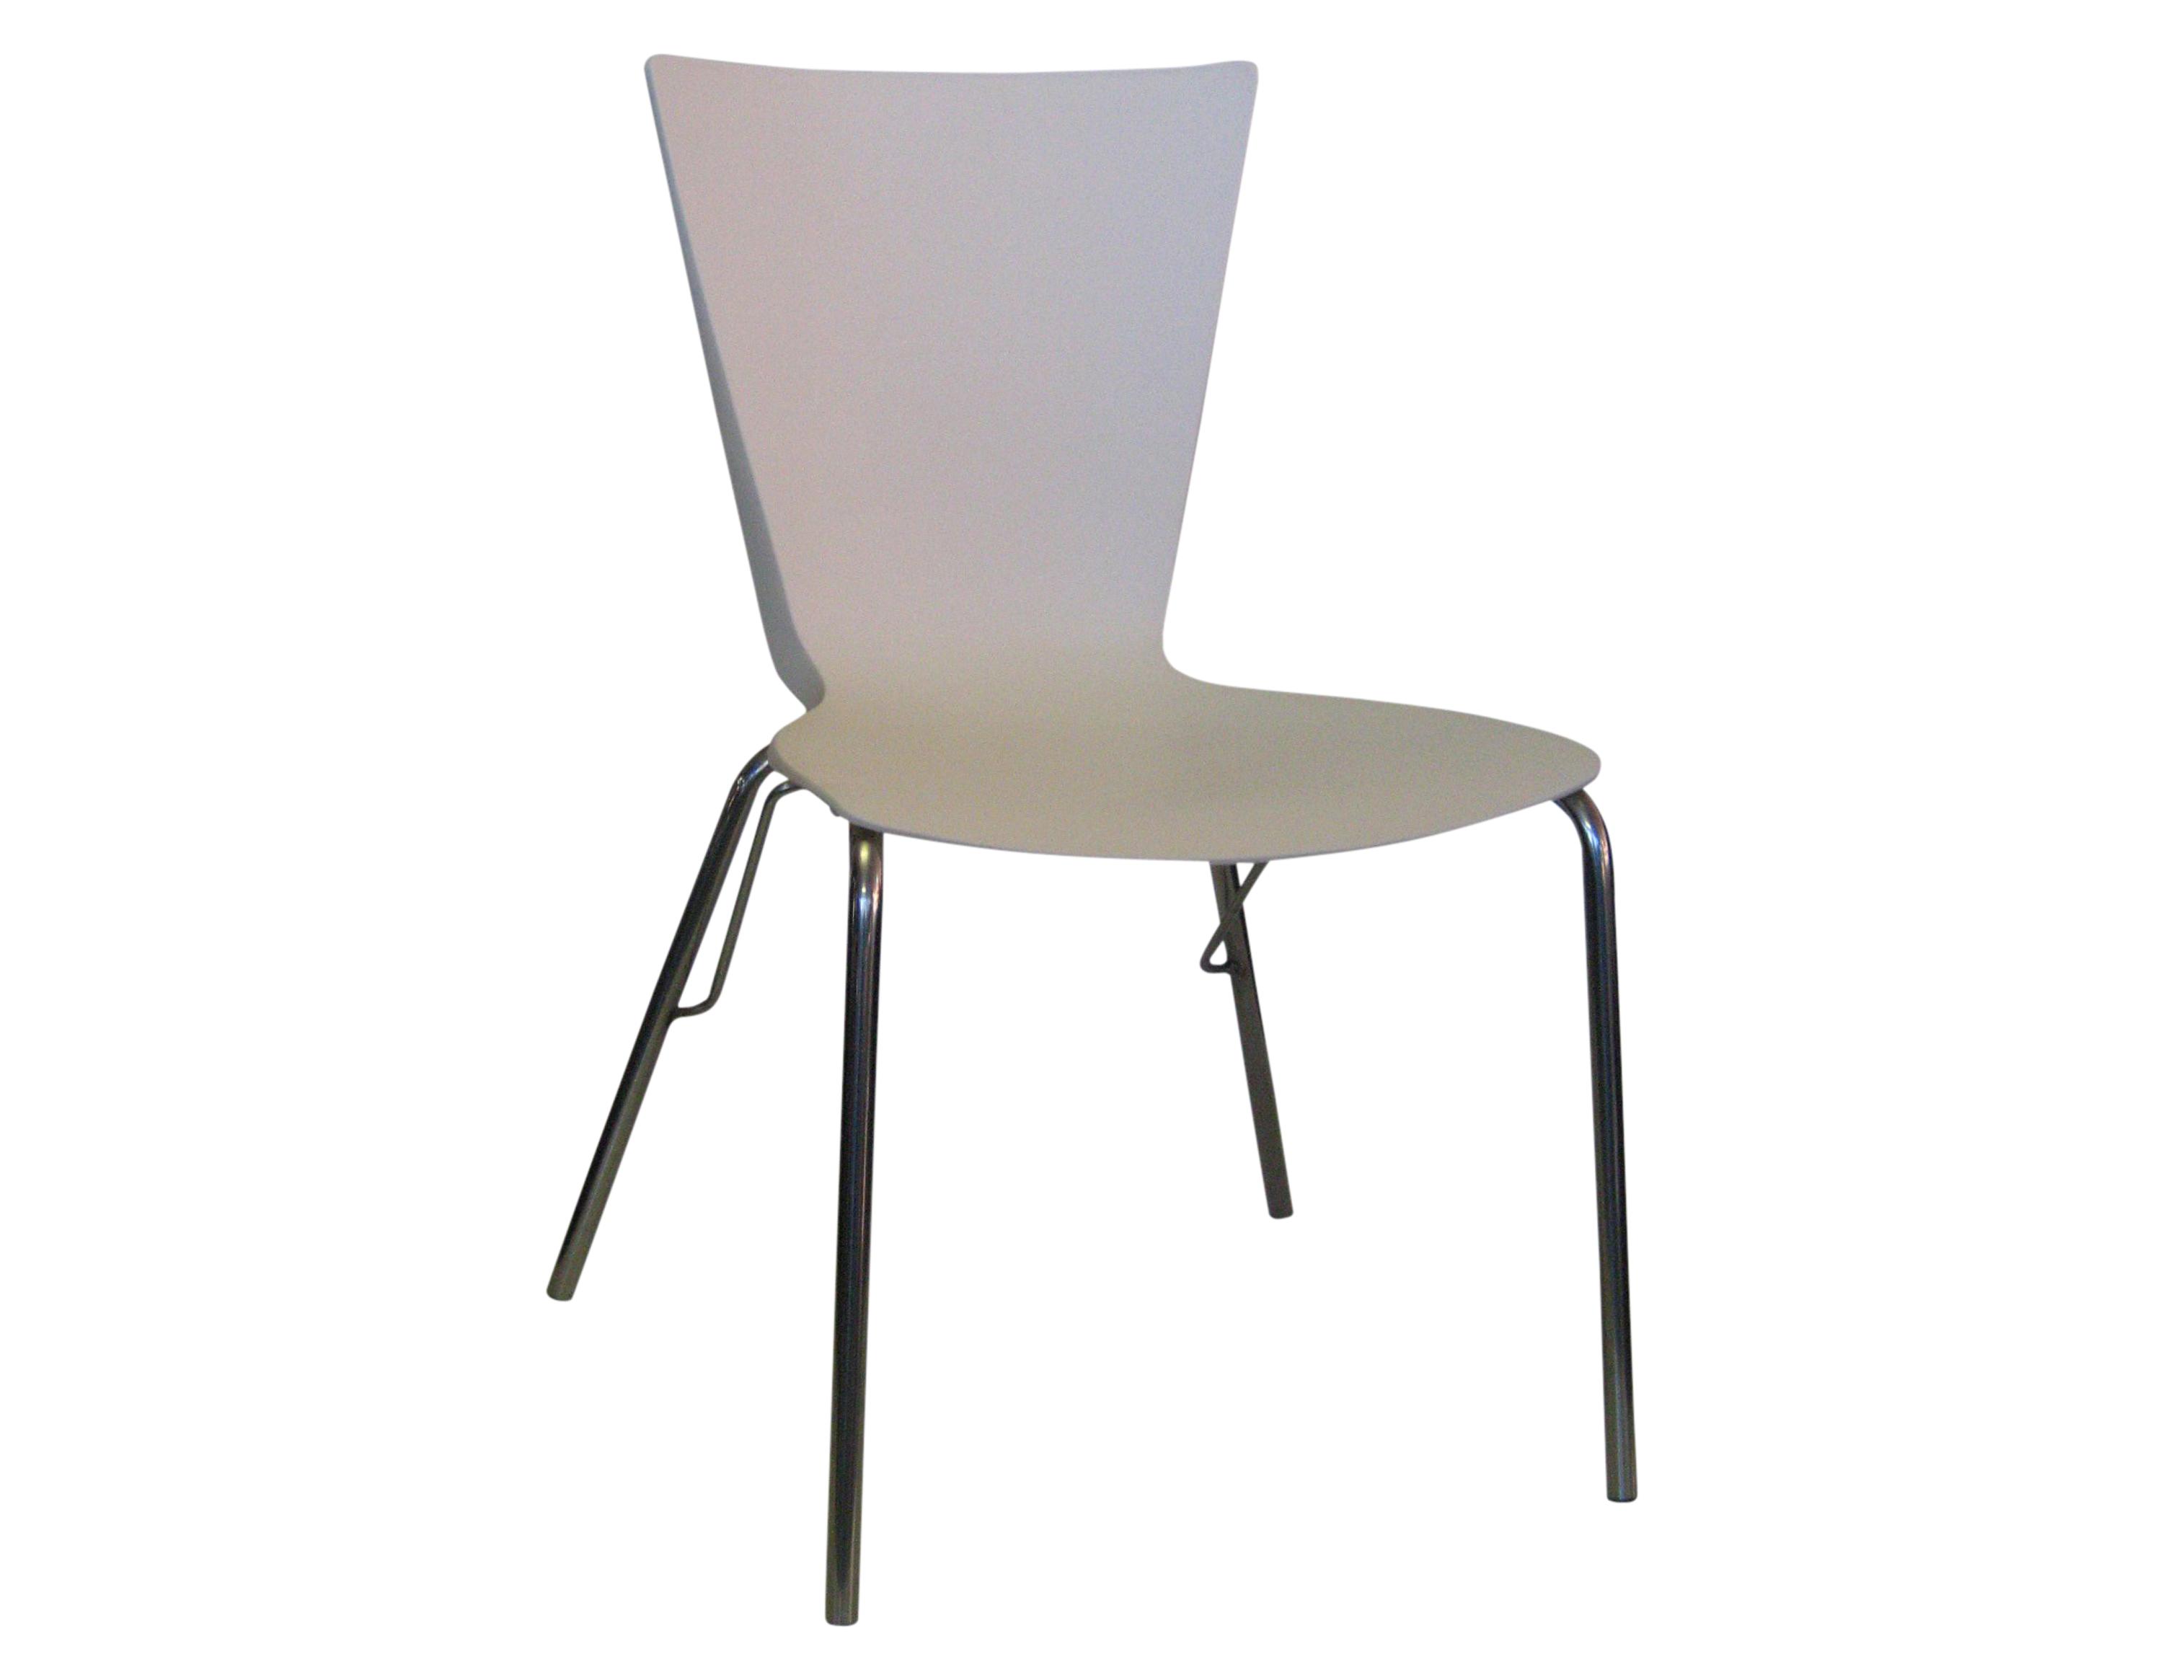 Bourke Stainless Steel Polypropylene Shell Chair Off